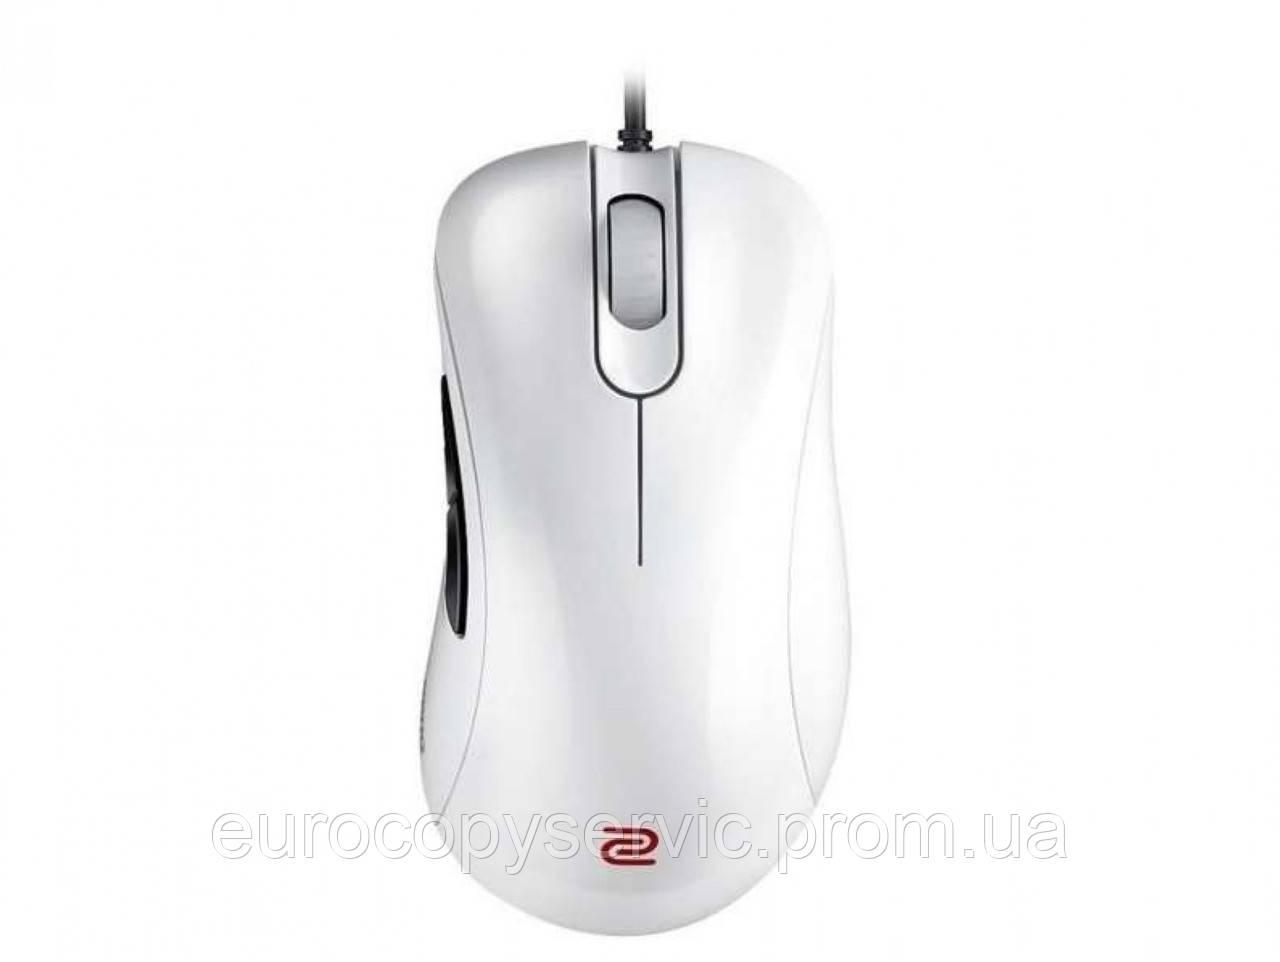 Ігрова миша дротова, EC2-A White (9H.N0RBB.A3E)